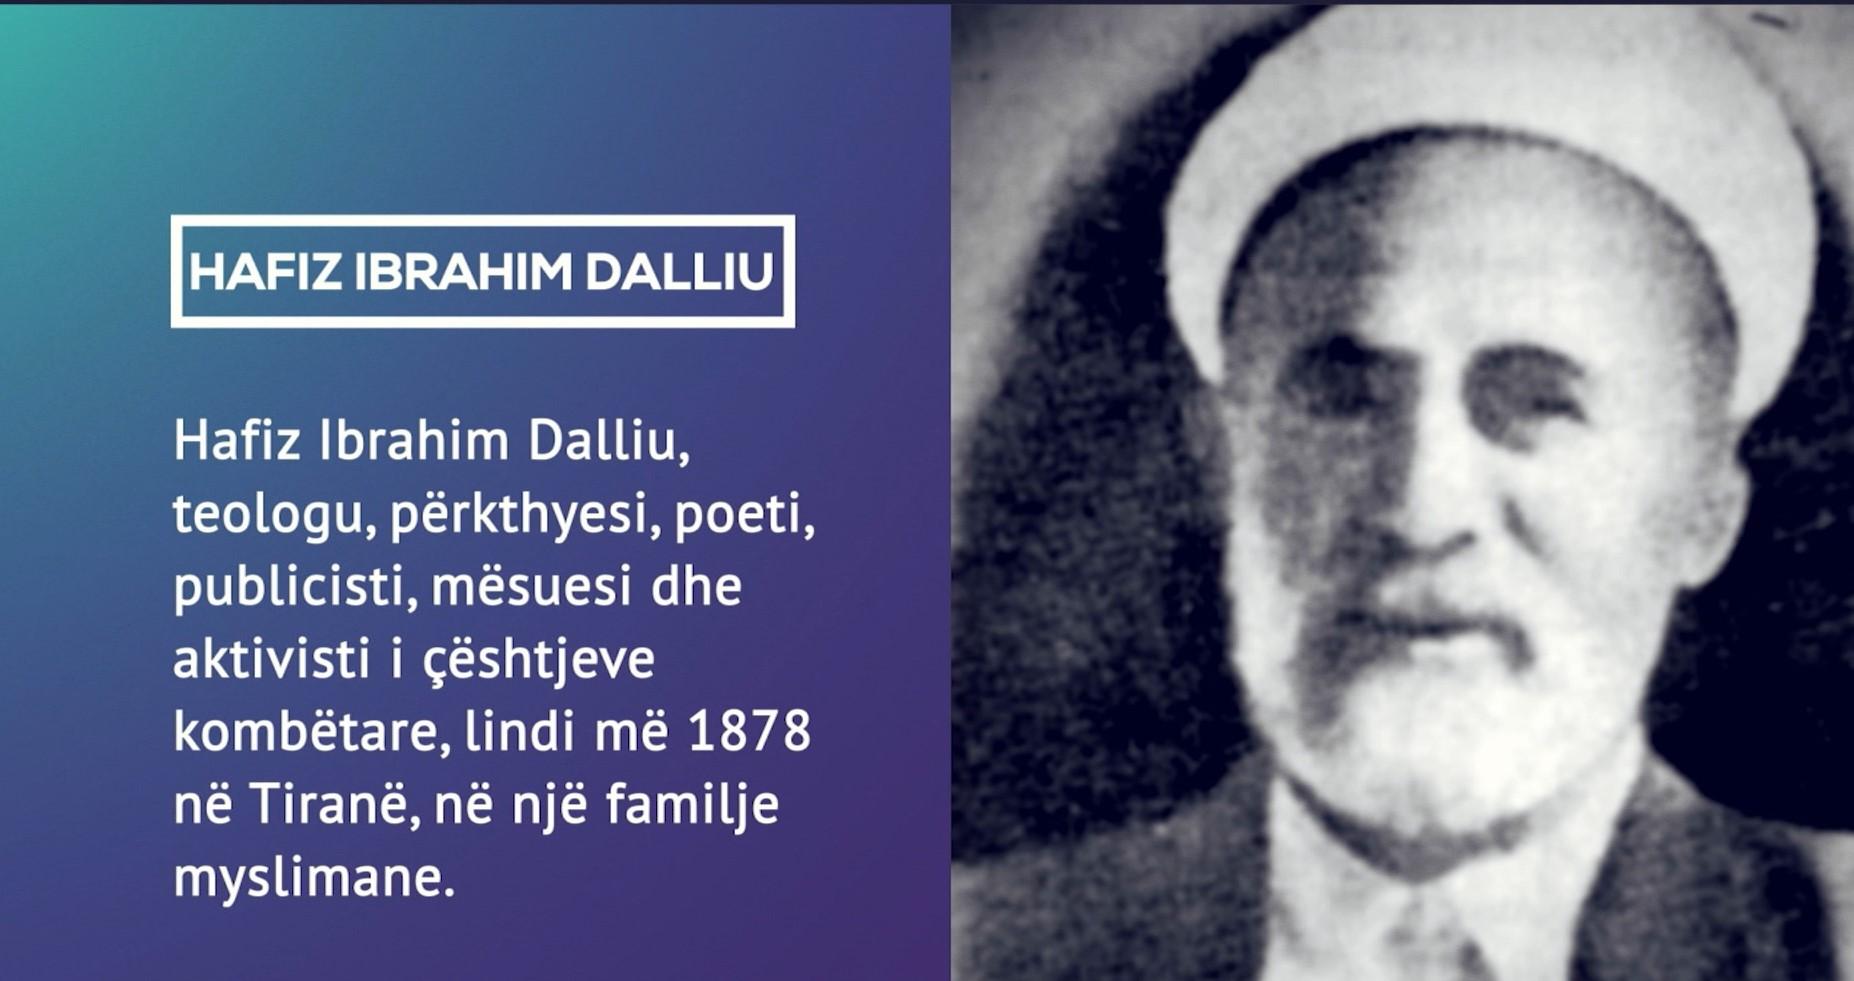 PROFIL / Hafiz Ibrahim Dalliu